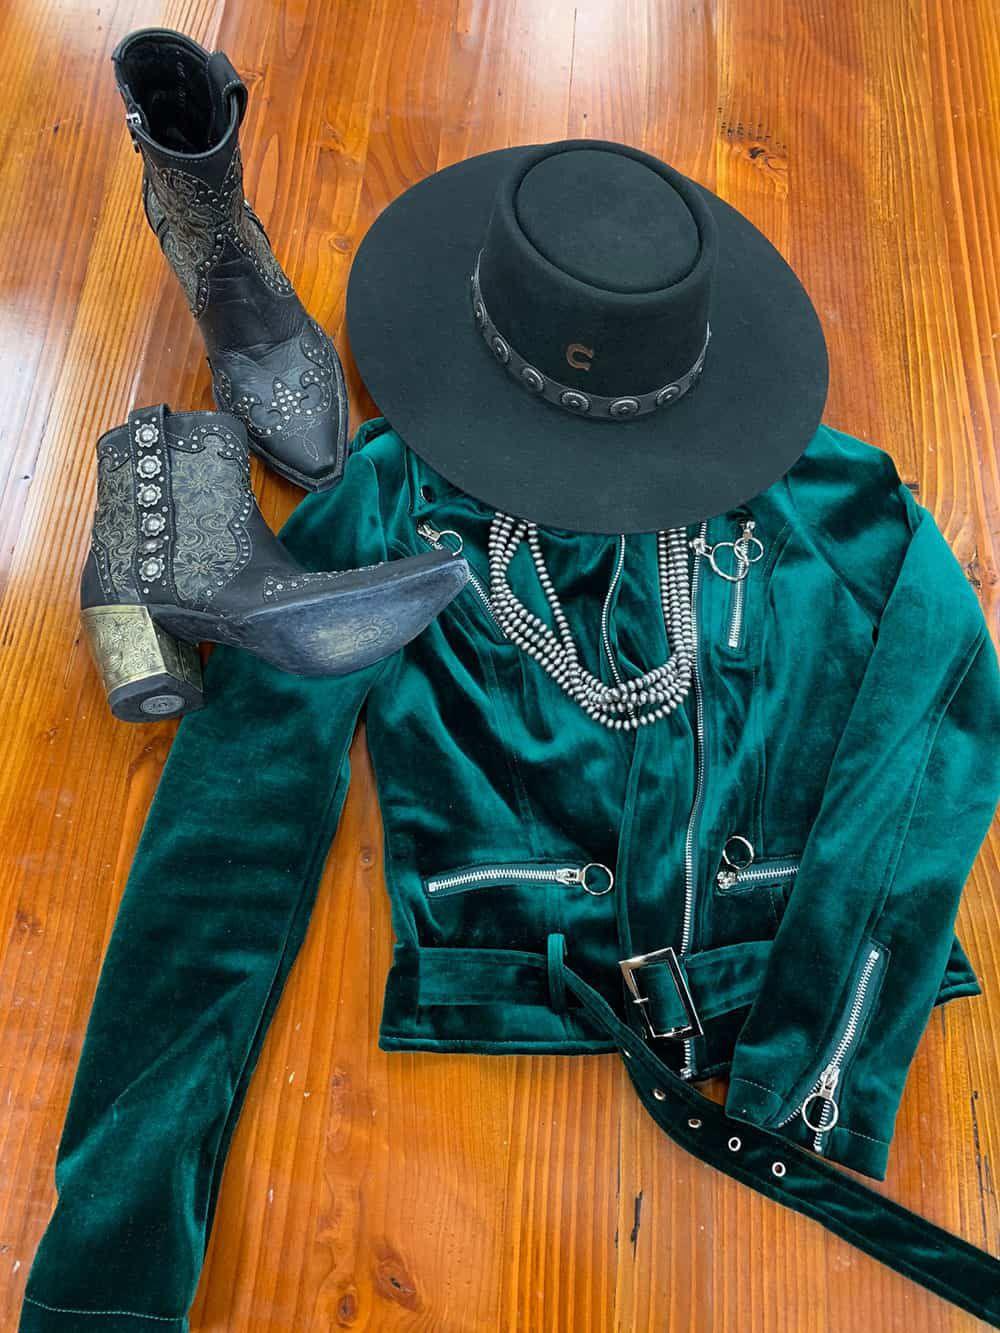 charlie 1 horse cowboy cowgirl hat high desert black flat brim nfr